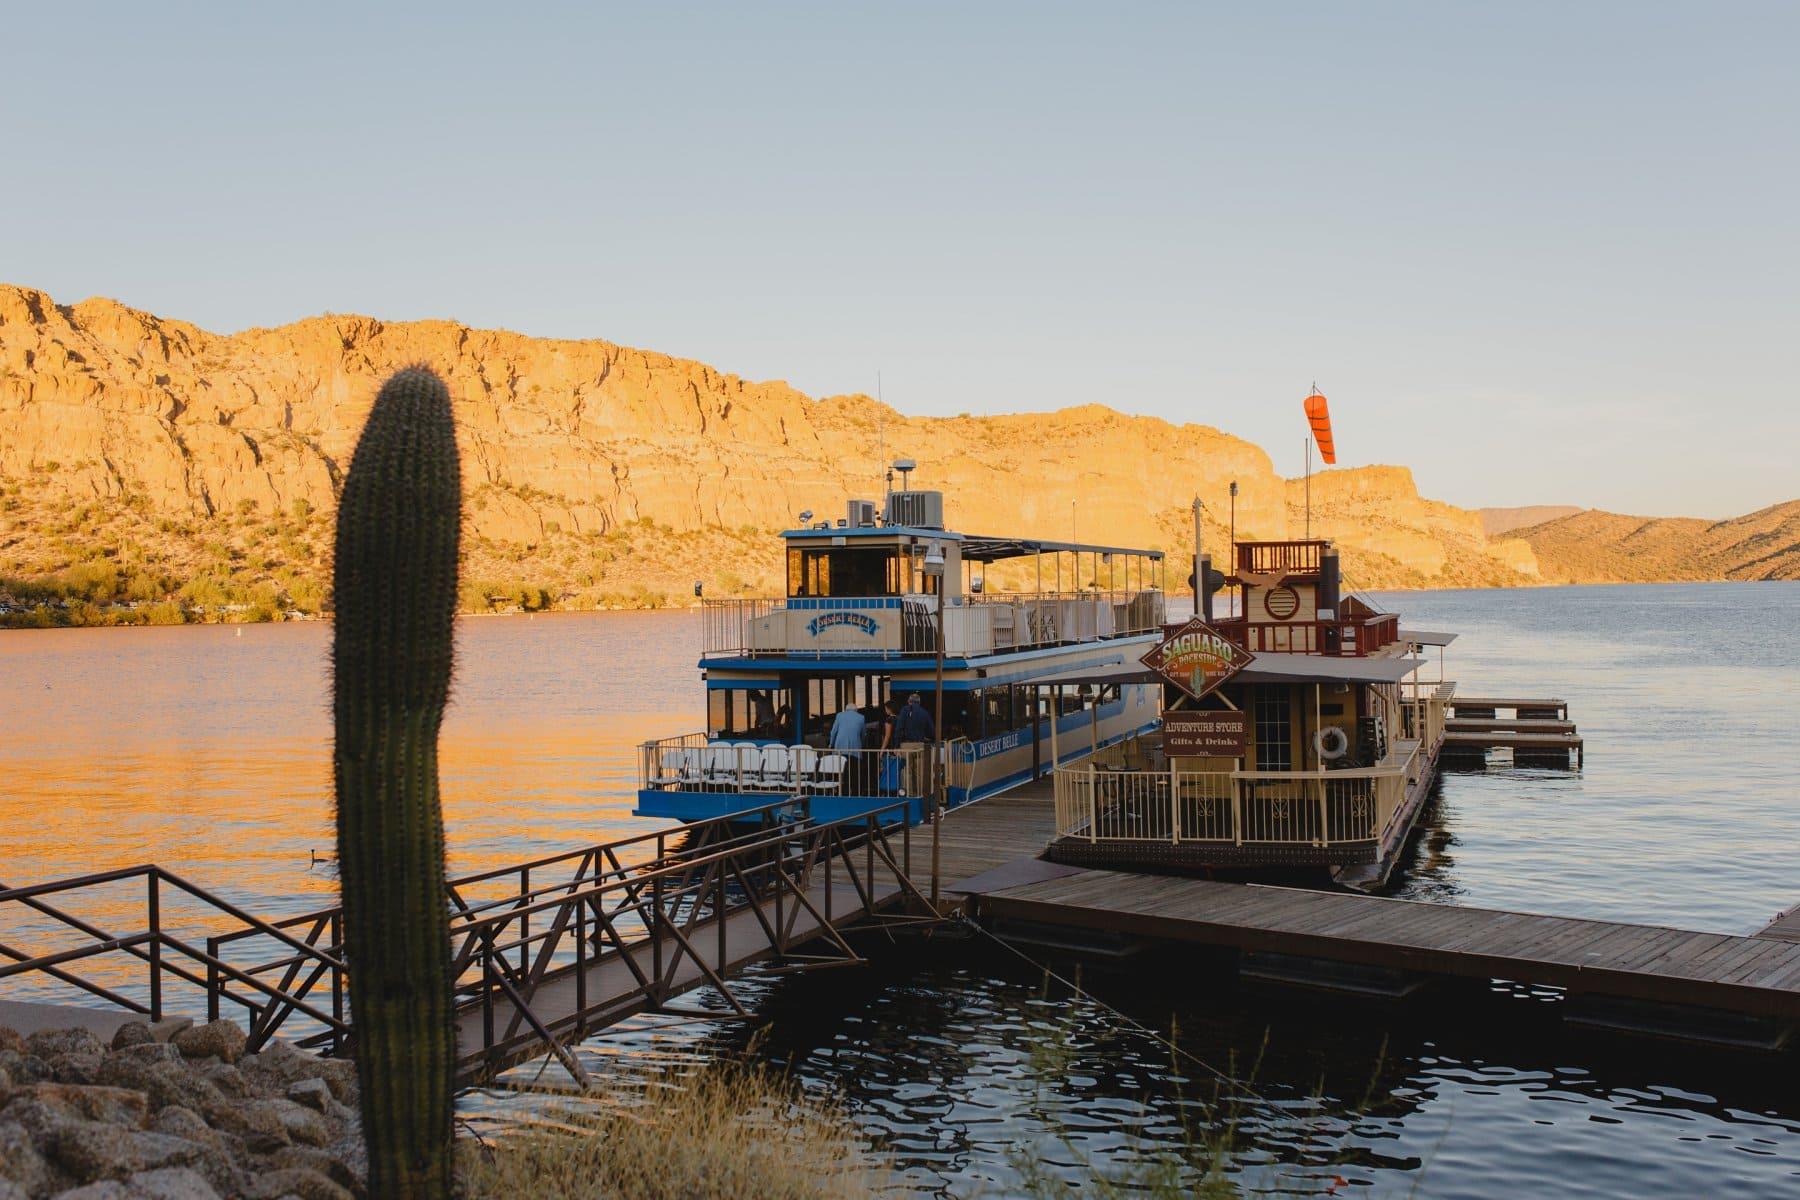 Desert Belle tour boat Saguaro Lake